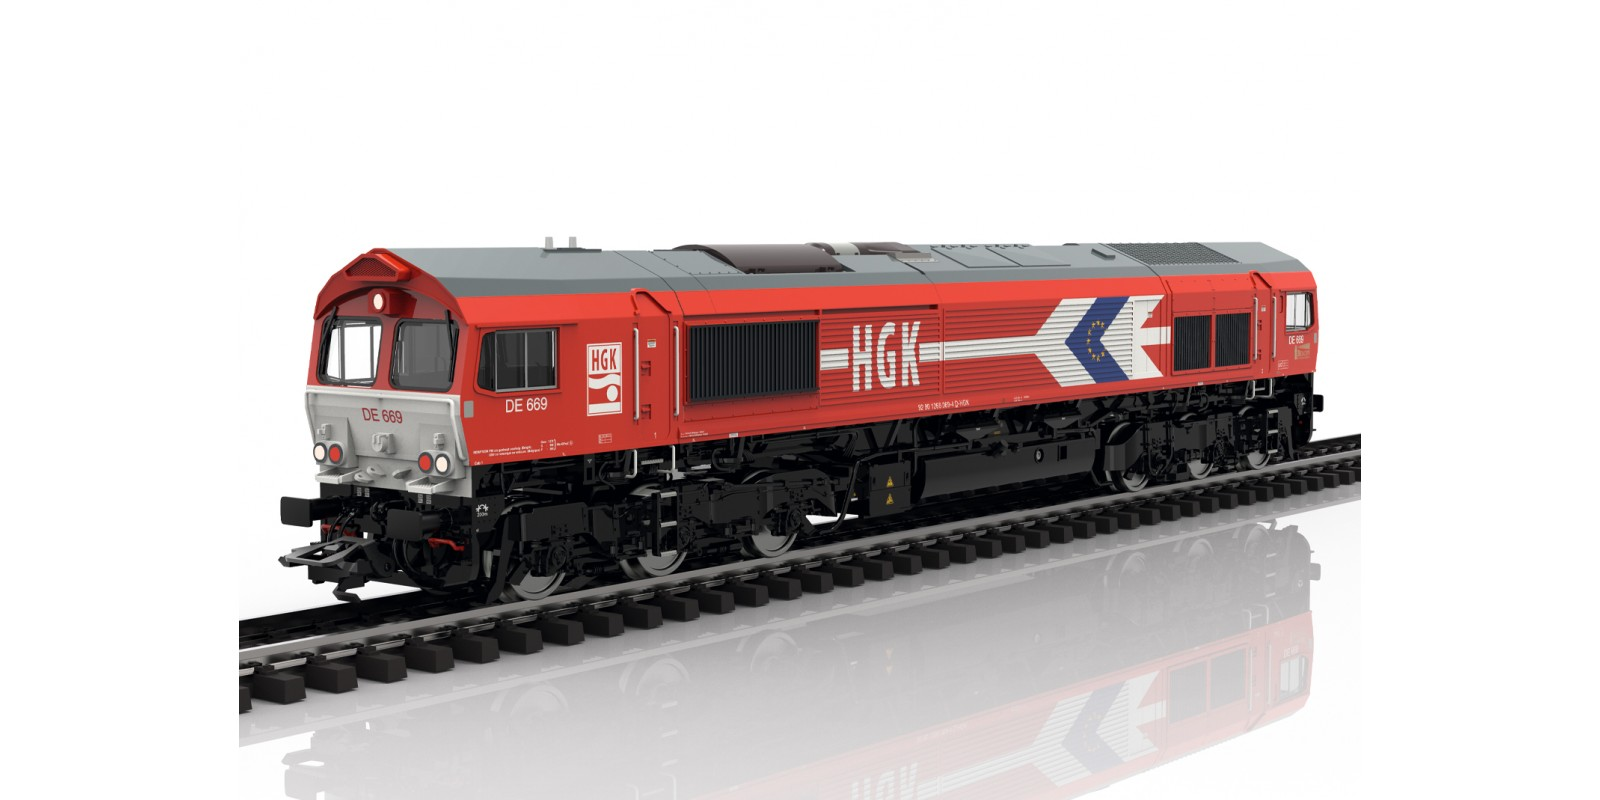 39060 Class 66 Diesel Locomotive